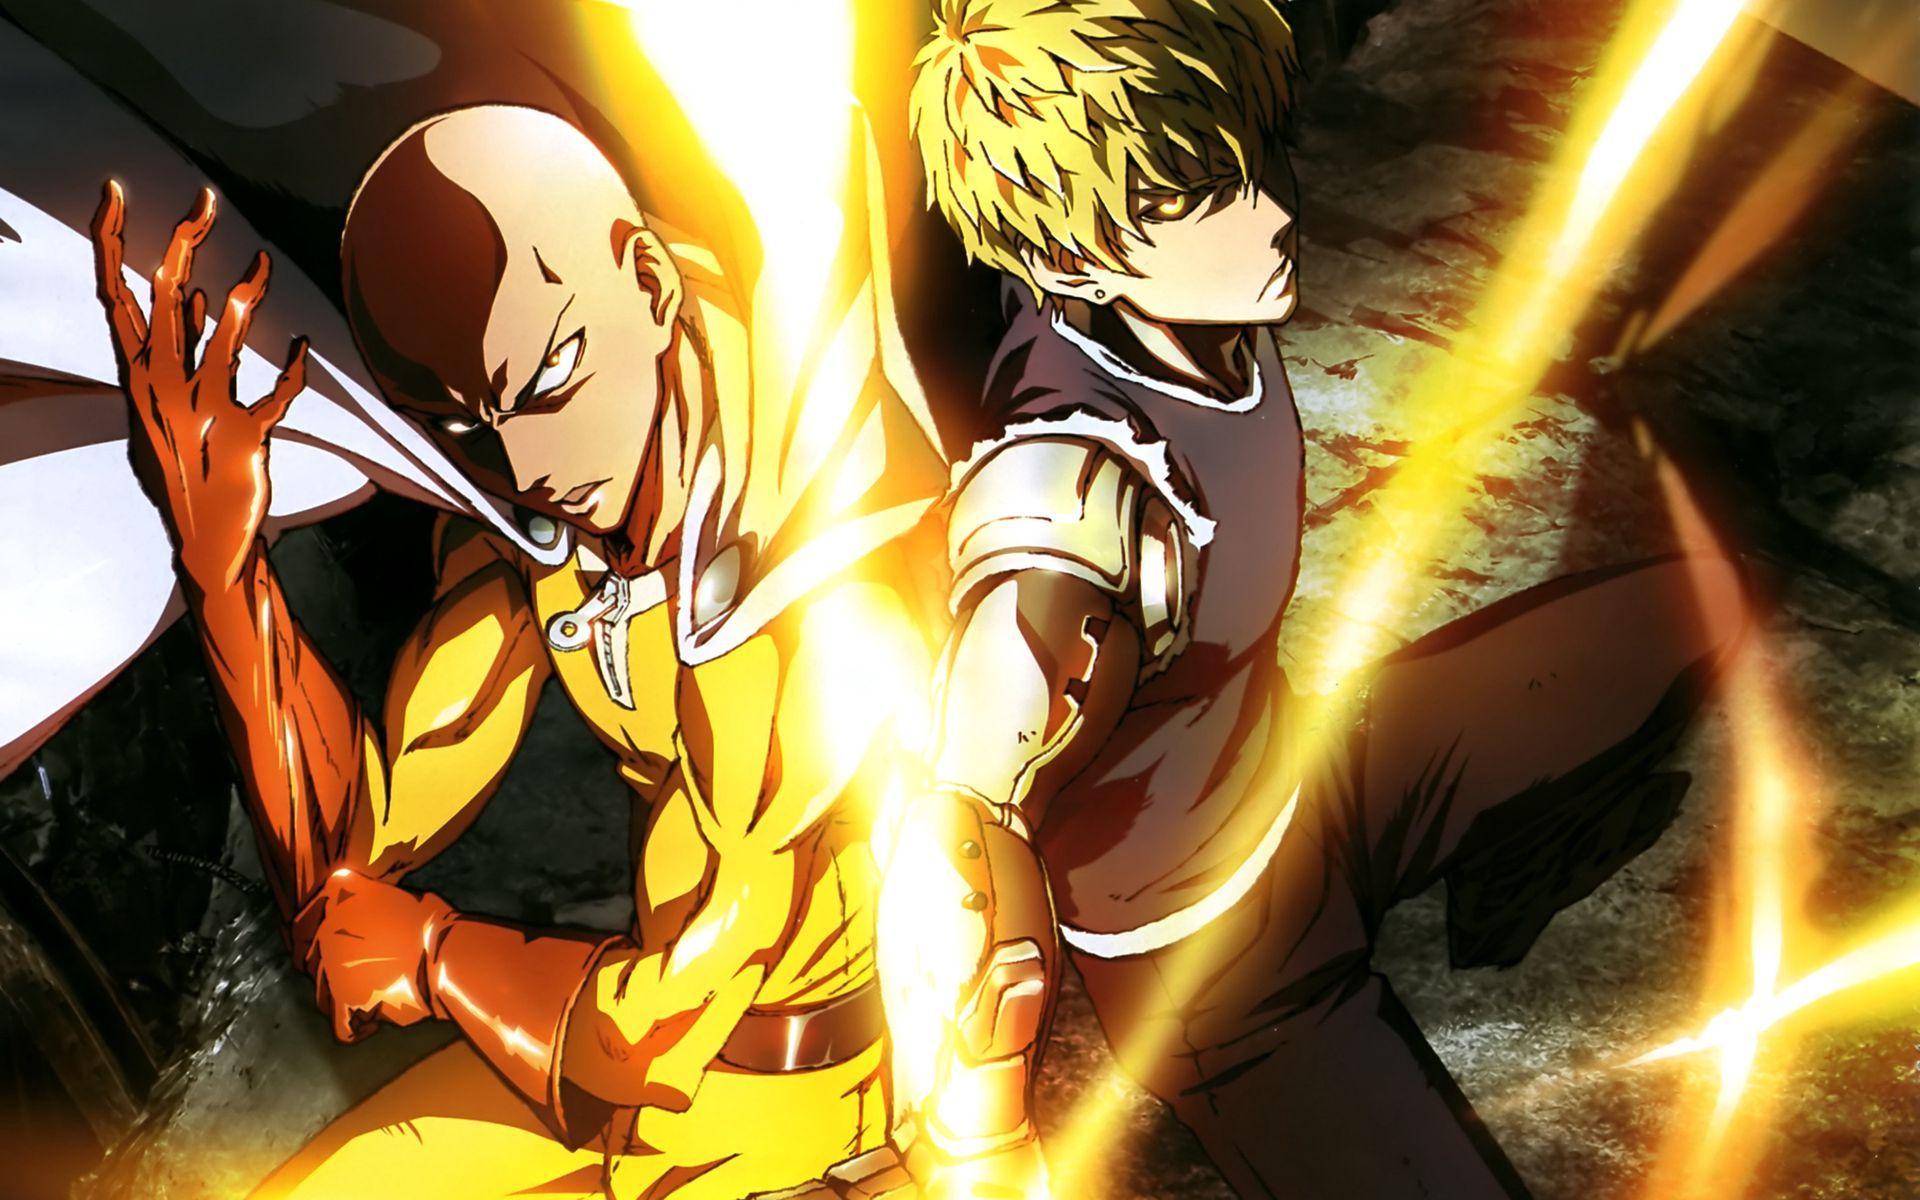 Imágenes De Anime in 2020 One punch man season, One